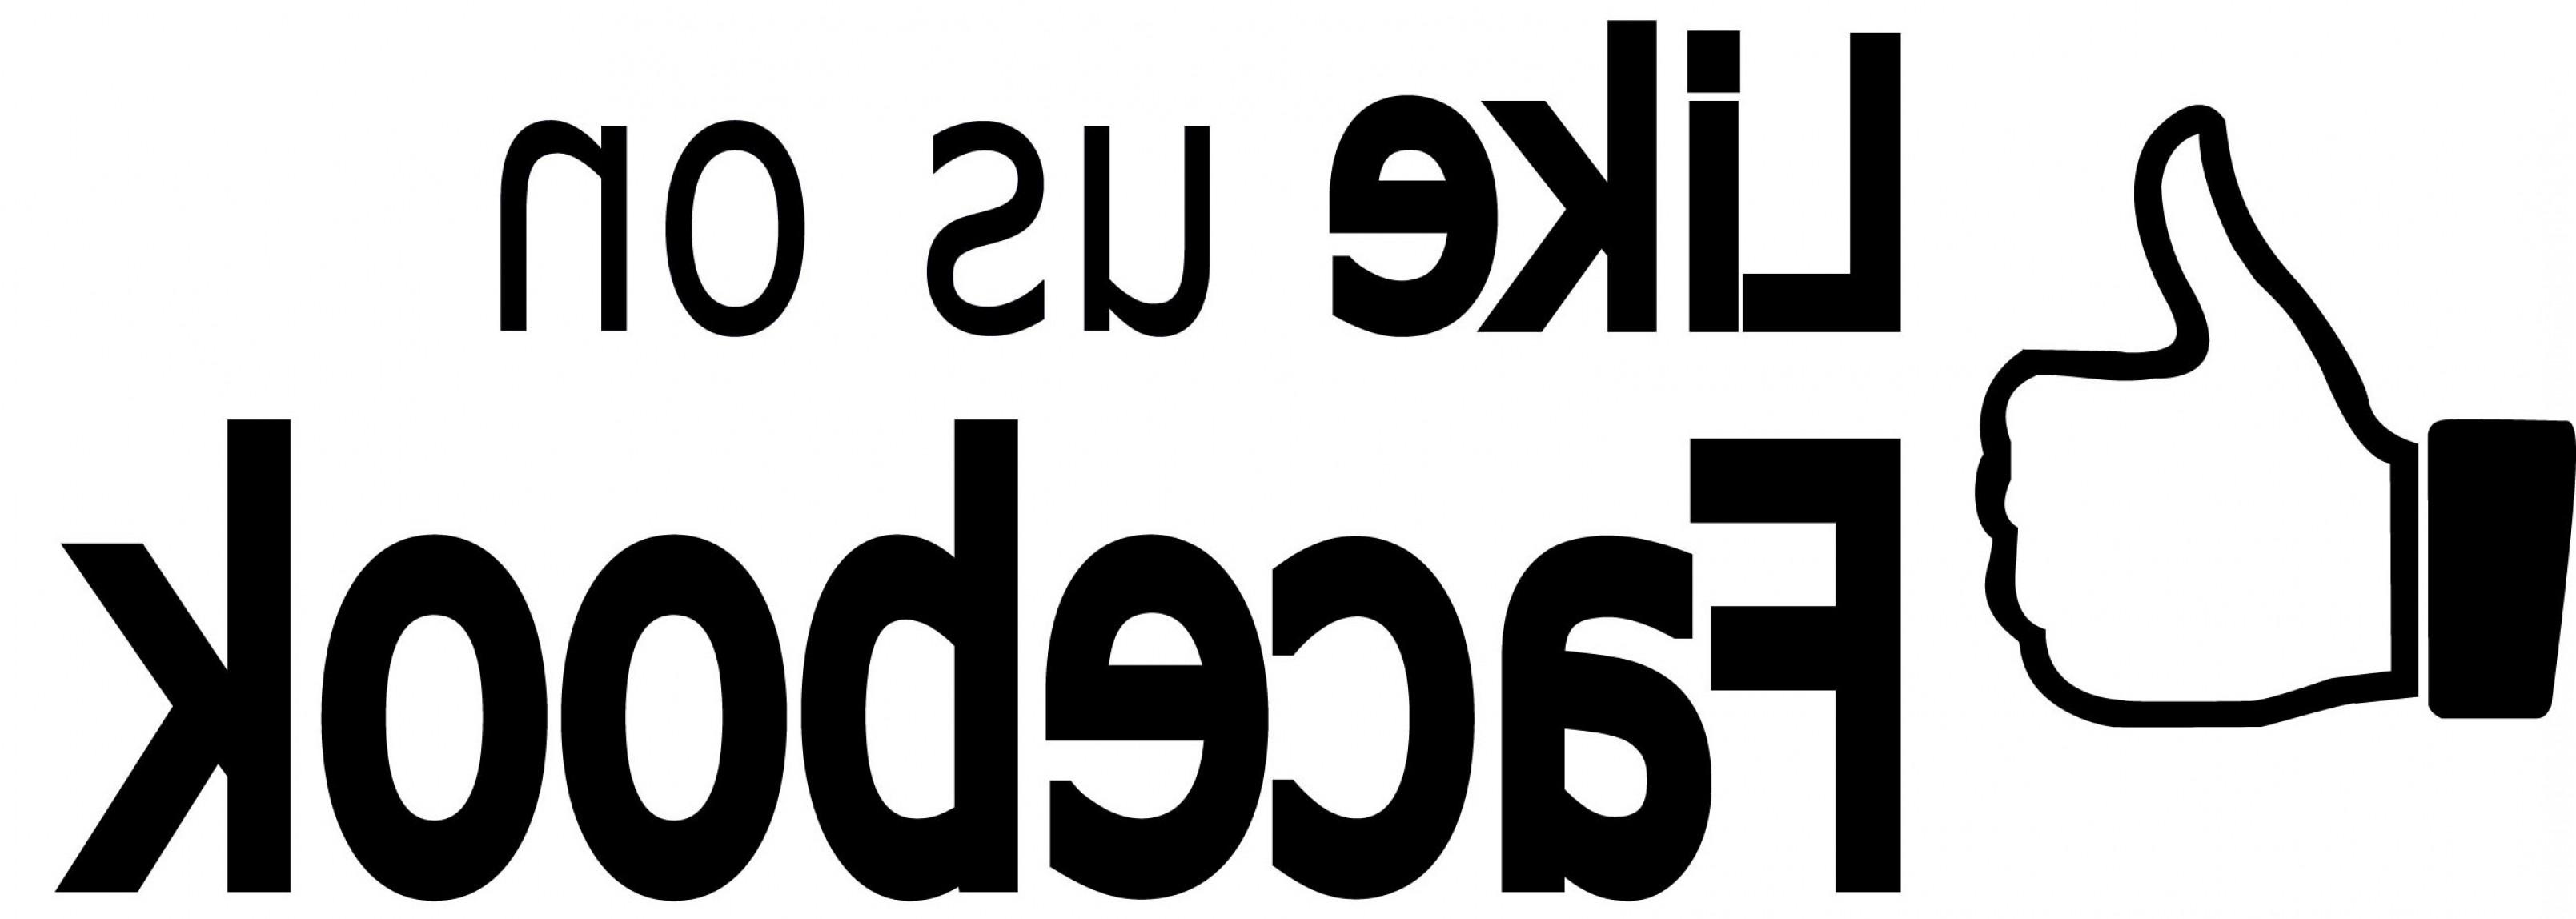 3218x1148 Like Us On Facebook Logo Vector Lazttweet